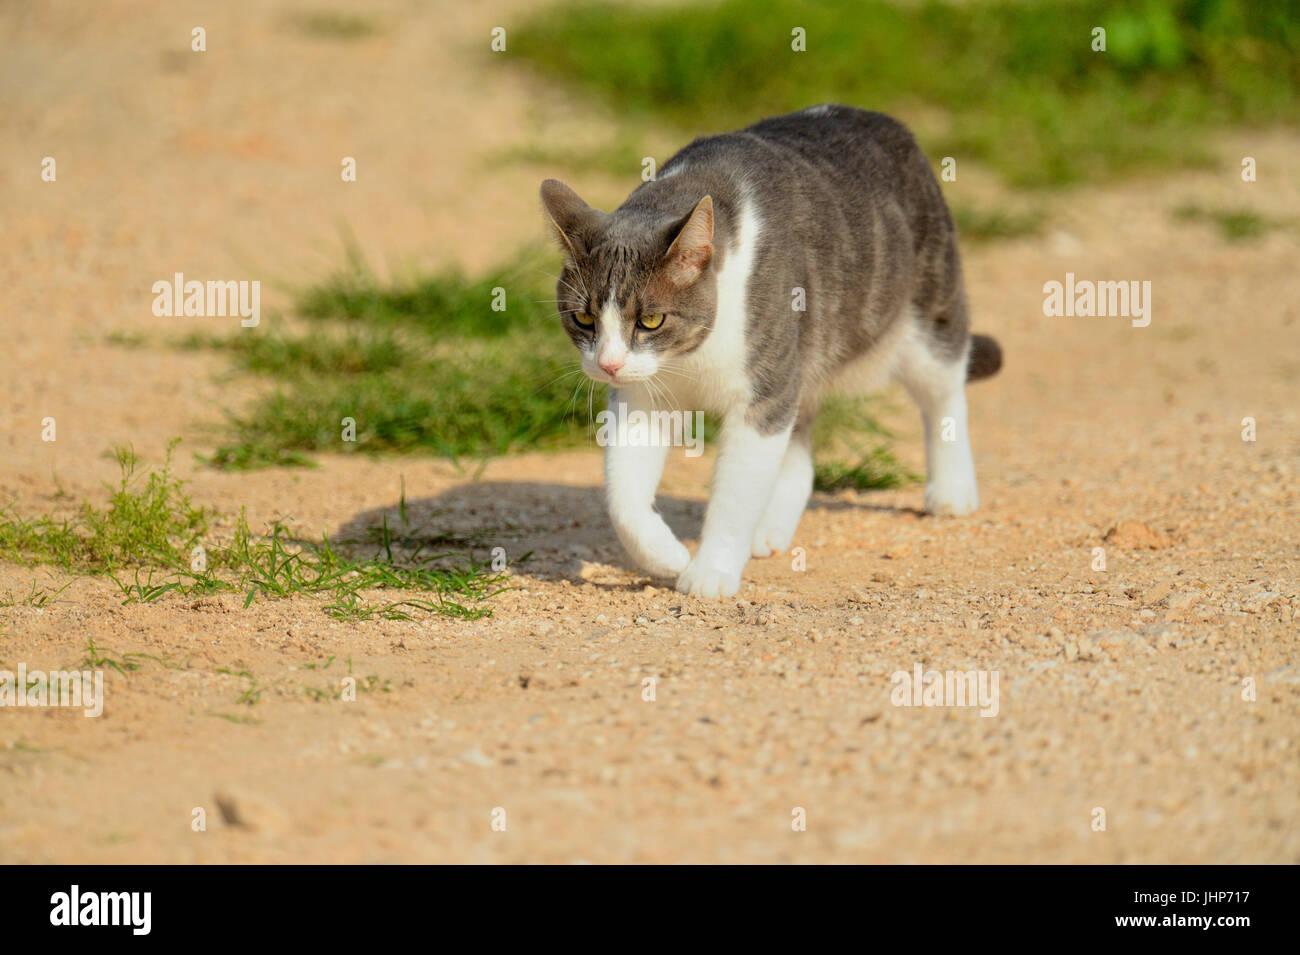 Domestic cat on the prowl, Rio Grande City, Texas, USA - Stock Image